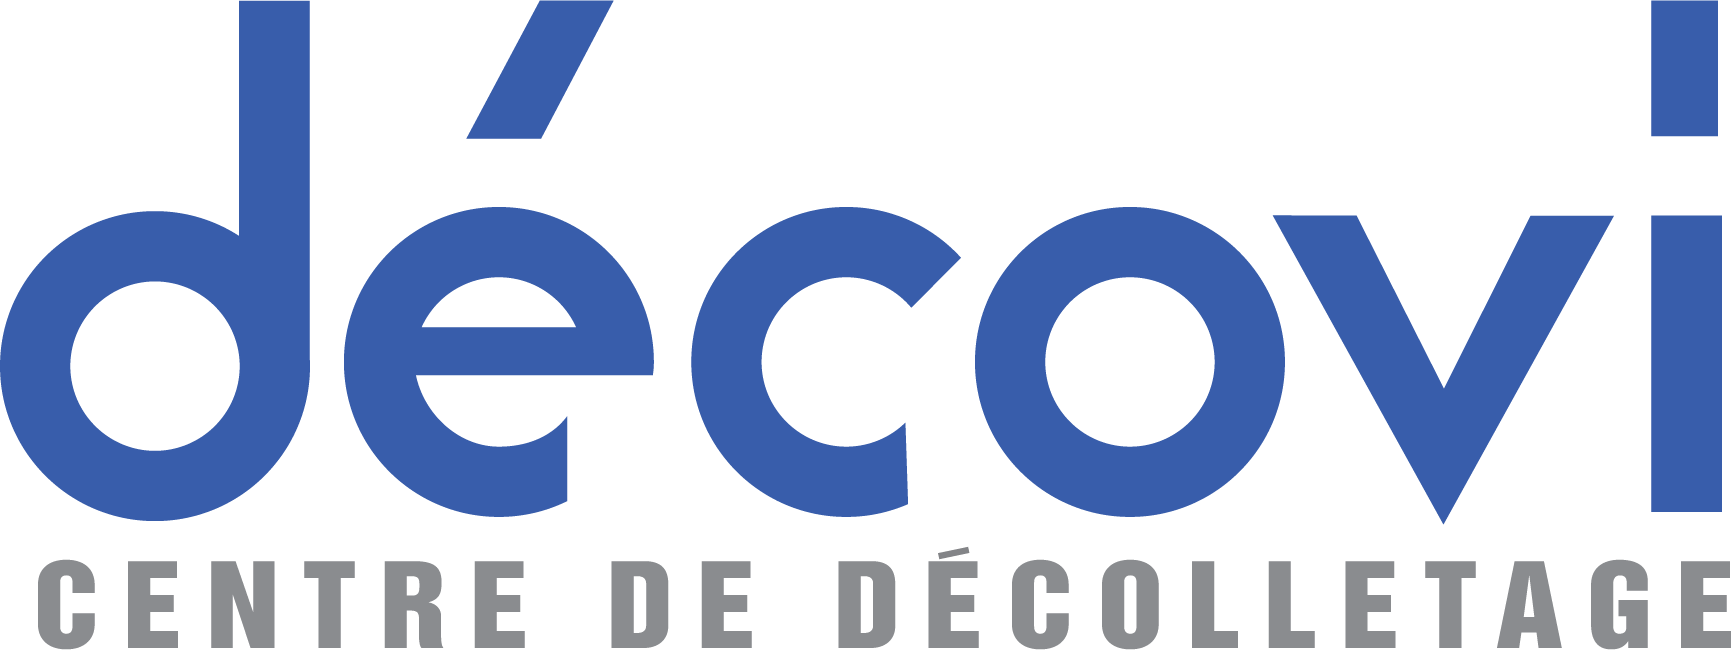 Decovi. Logo.